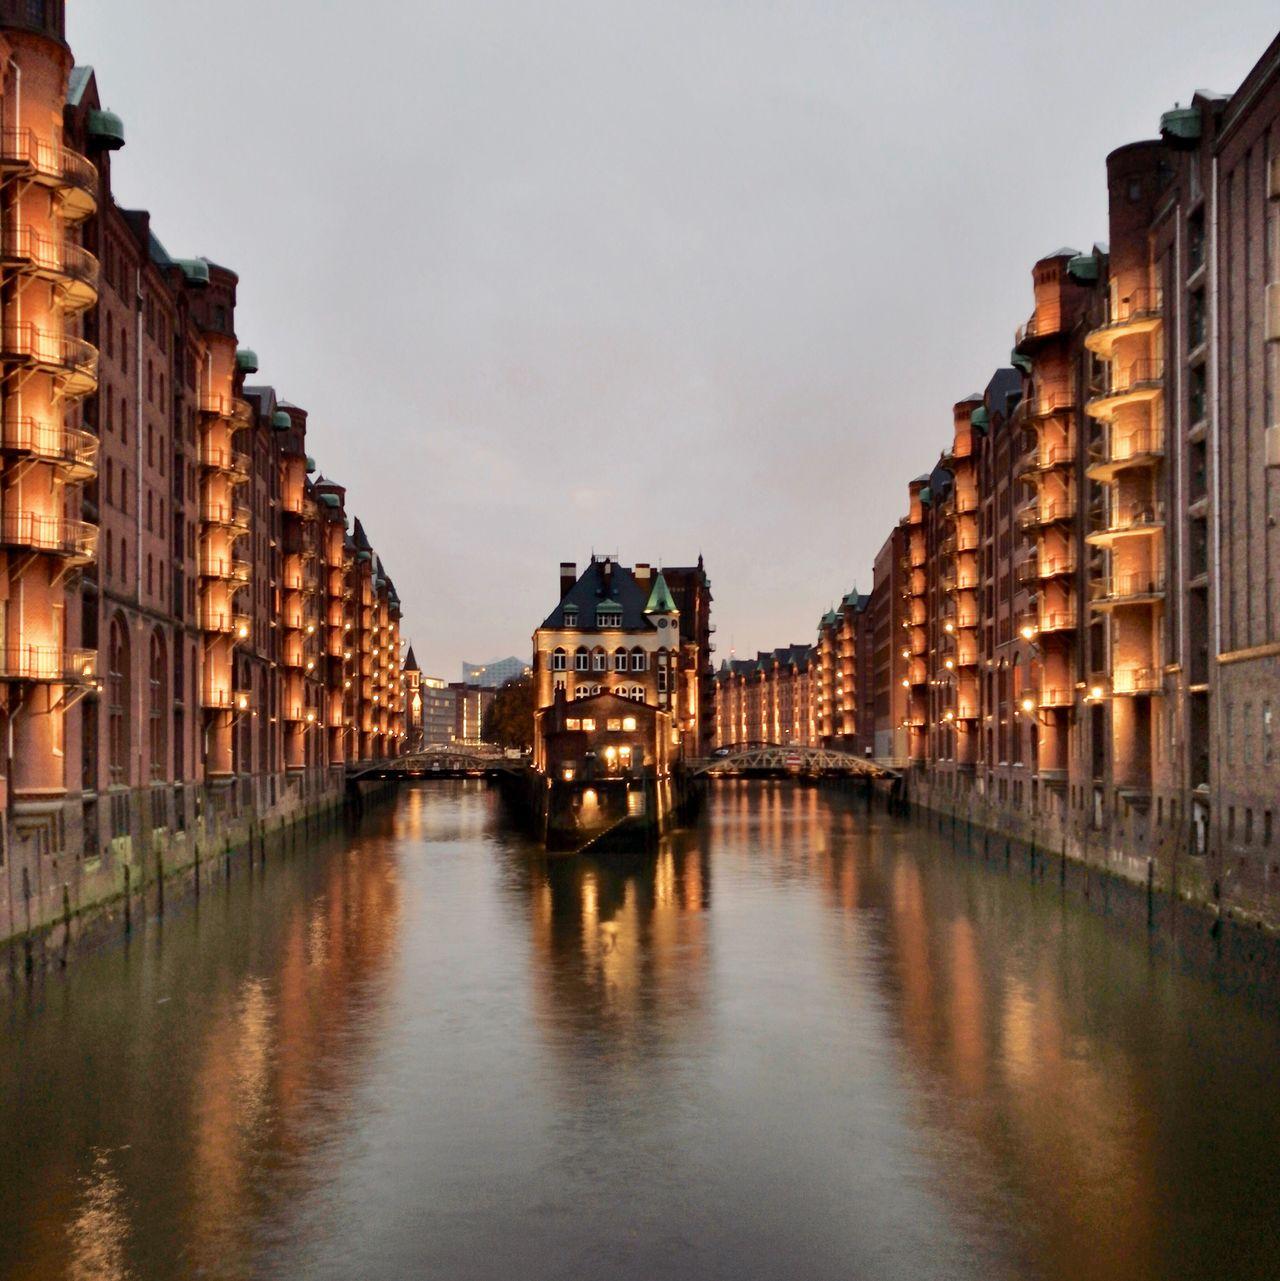 Hamburg Warehouse Speicherstadt Fleet UNESCO World Heritage Site Canal Architecture Building Exterior Built Structure Water Reflection City Waterfront Sky Illuminated Outdoors No People Day (null) Germany Elbphilharmonie Fleetschlösschen